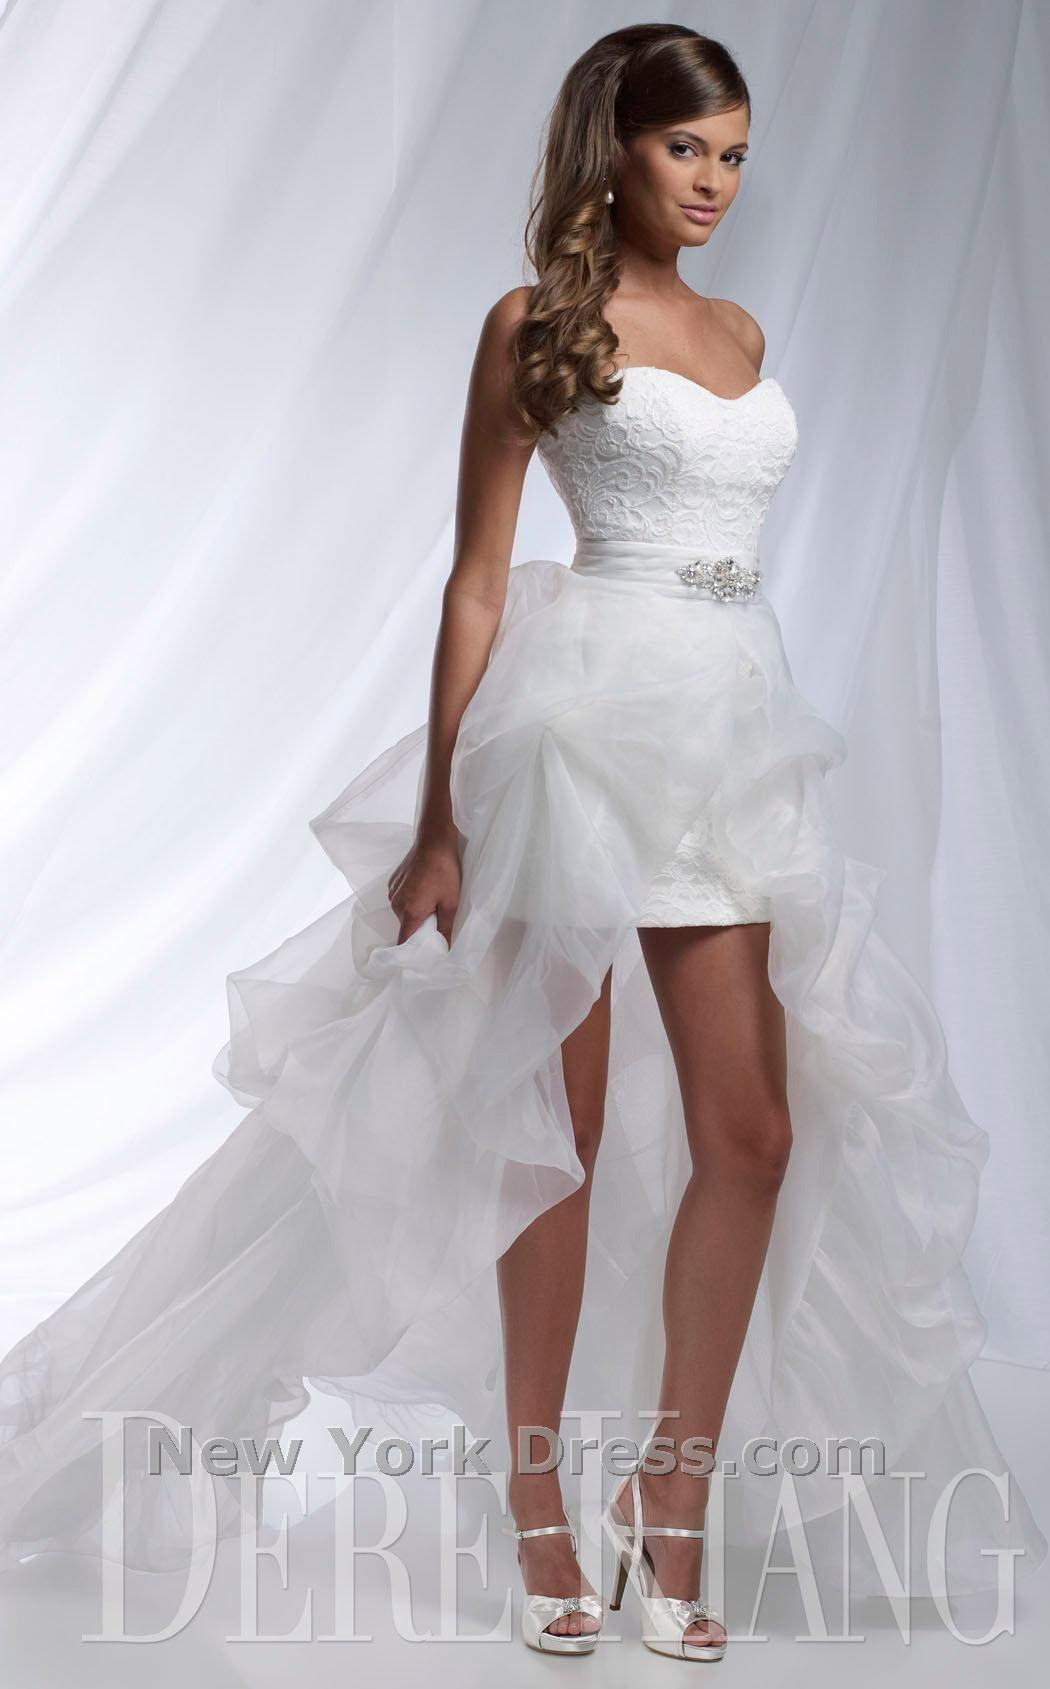 Dere kiang dress 11125 wedding dress wedding and weddings for Wedding dress rentals in vegas